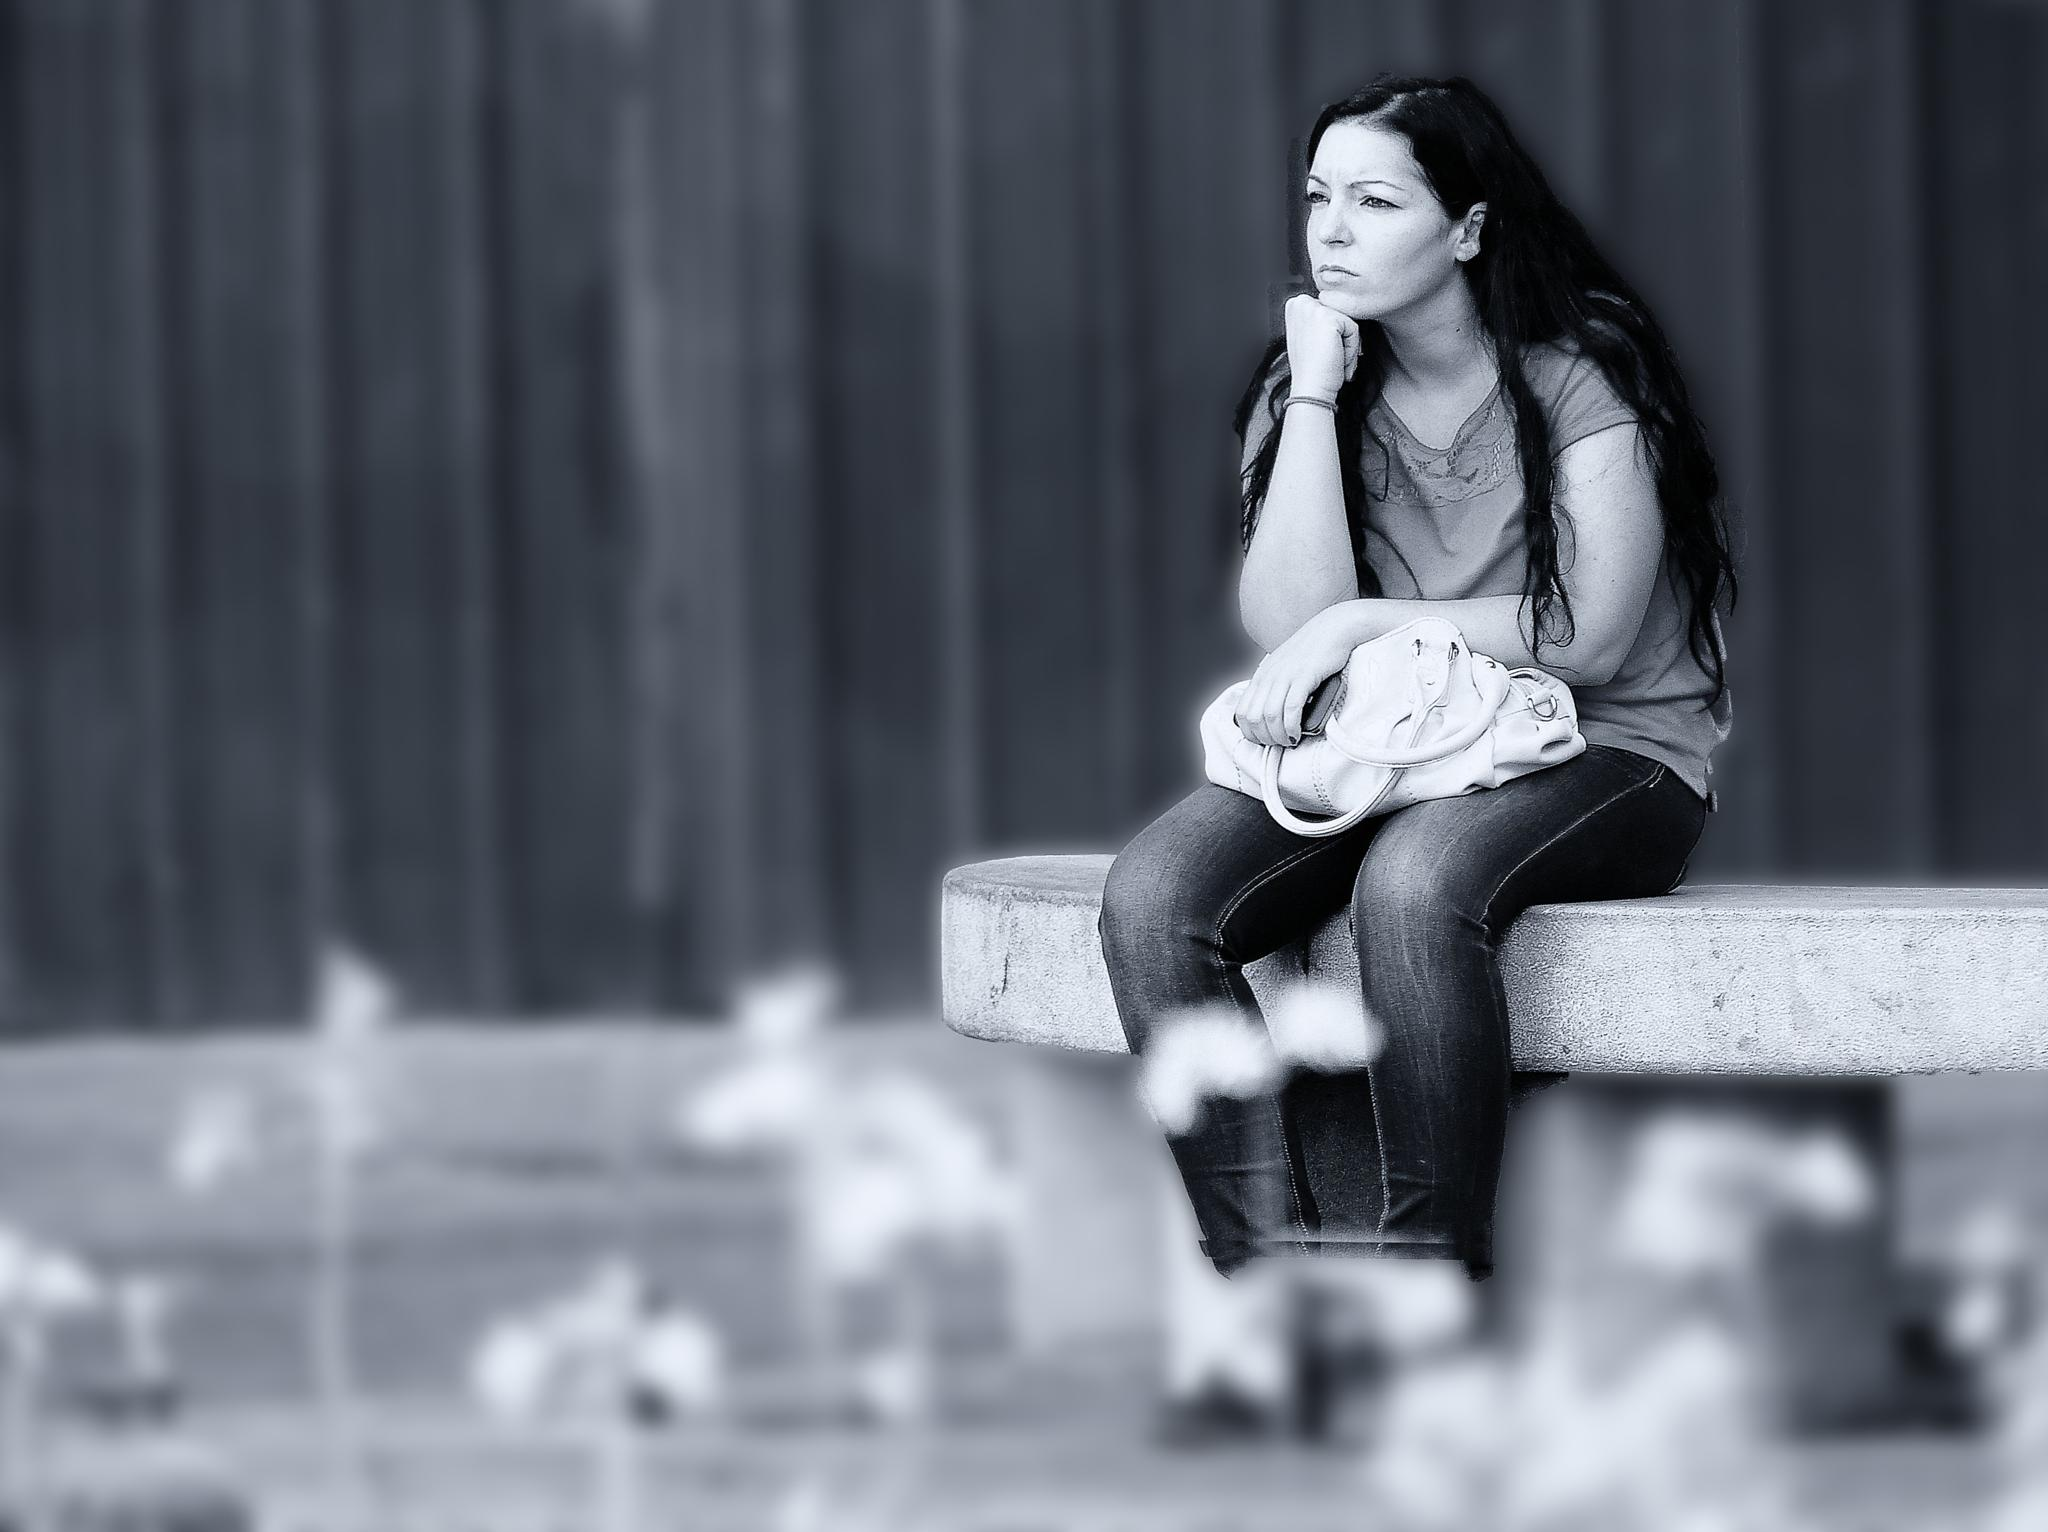 Photo in Black and White #miradas #calle #blanco y negro